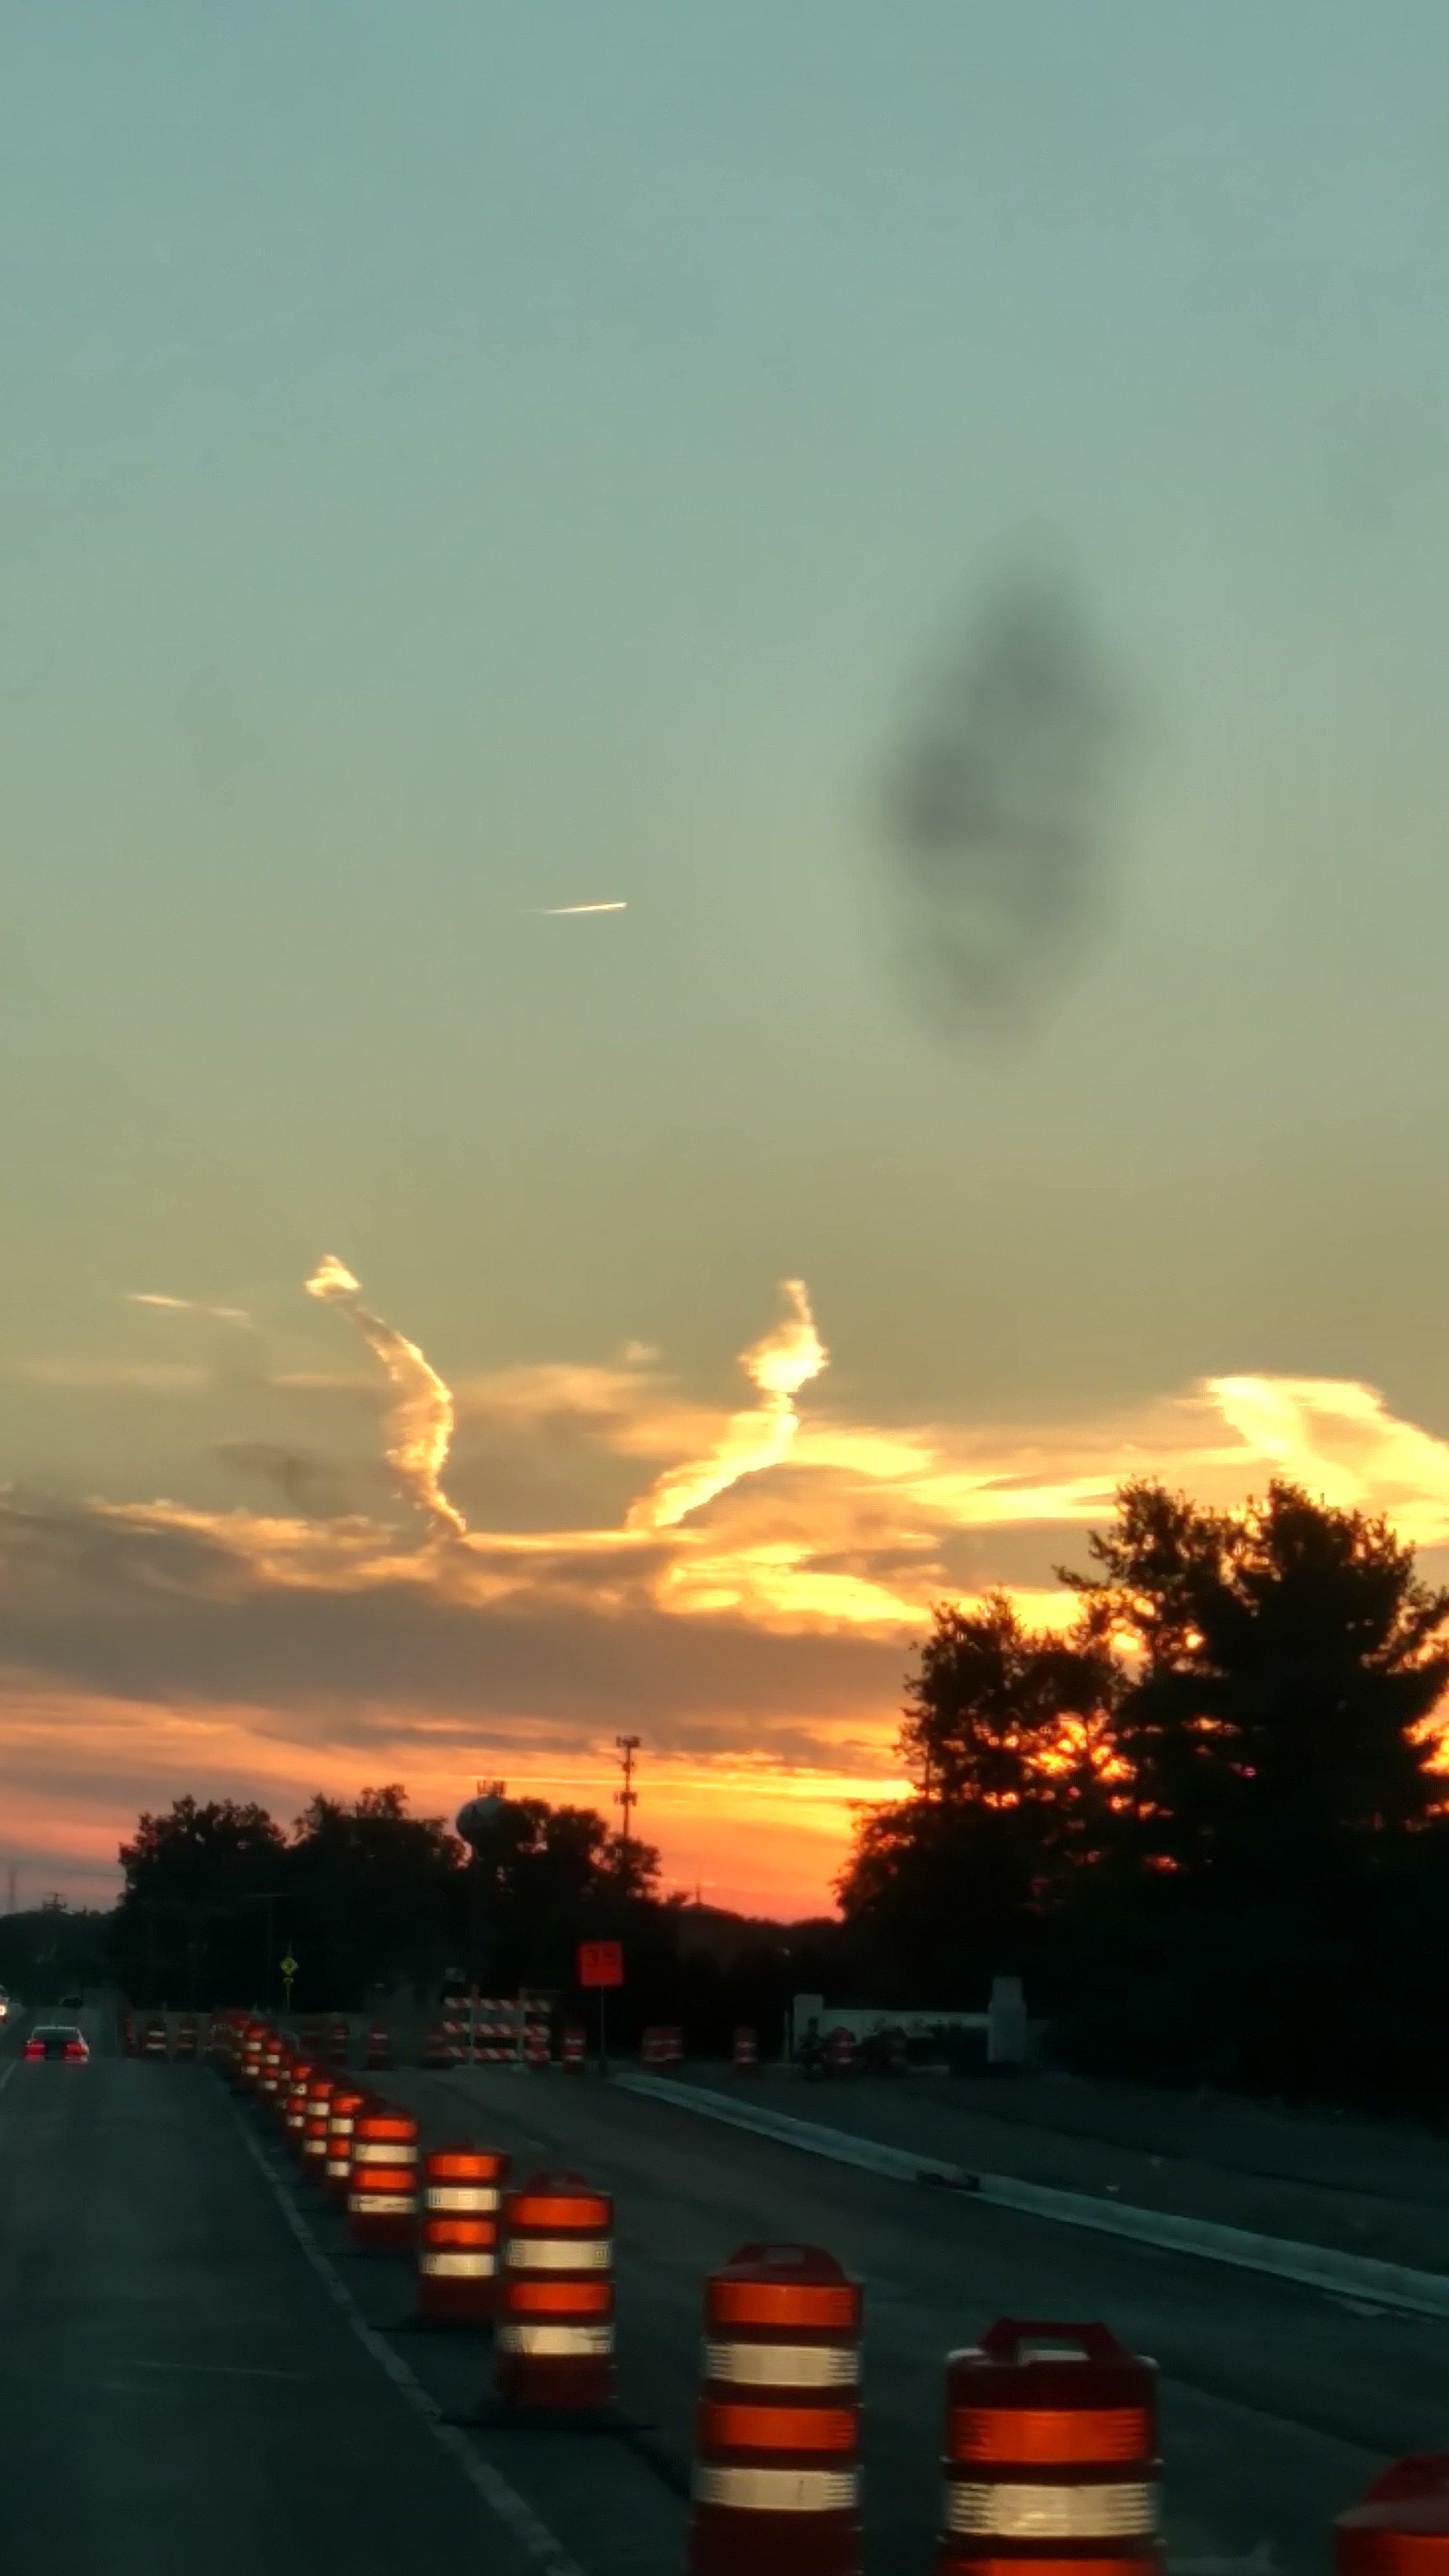 sunset crossing construction bridge.jpg